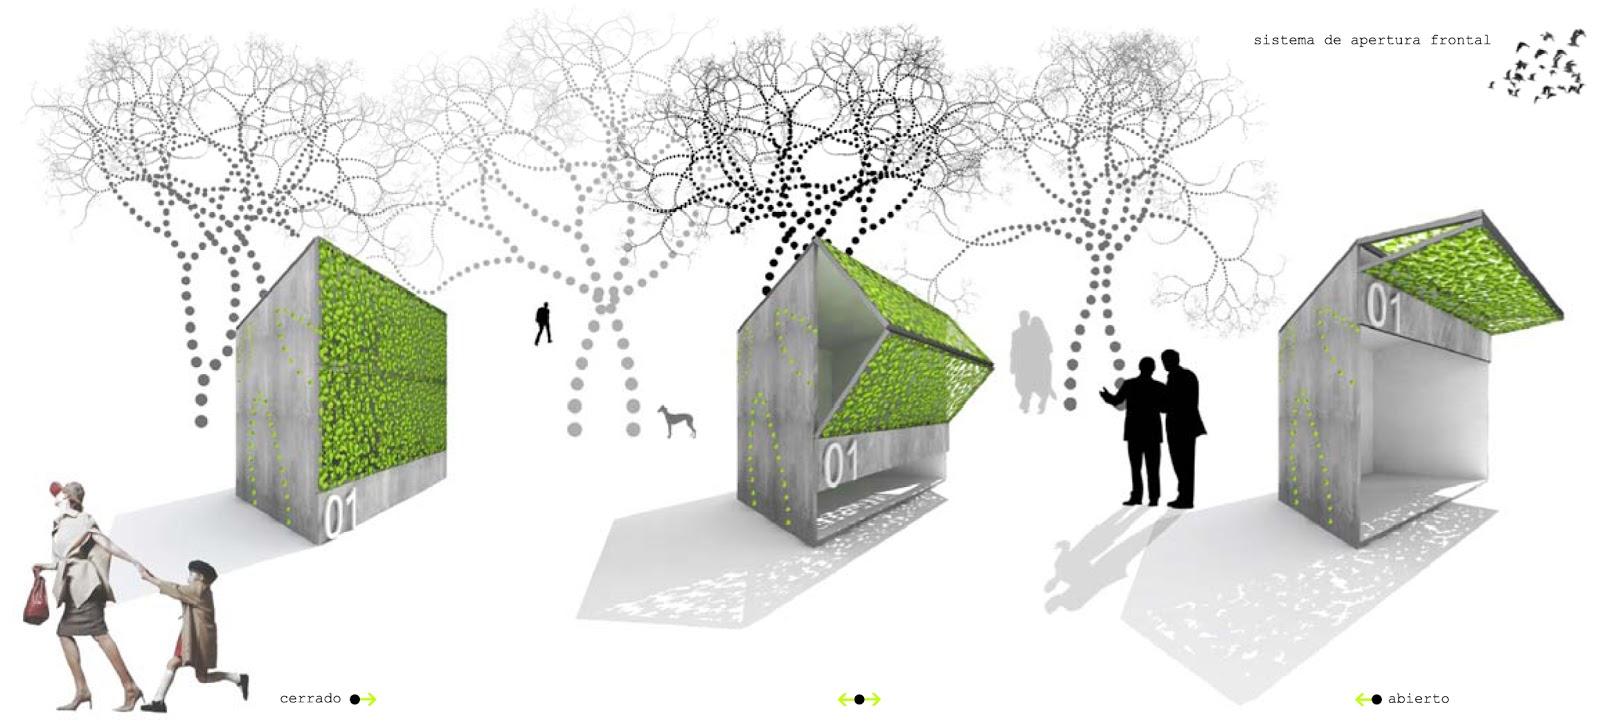 1000 images about drawings models on pinterest for Caseta jardin ergo